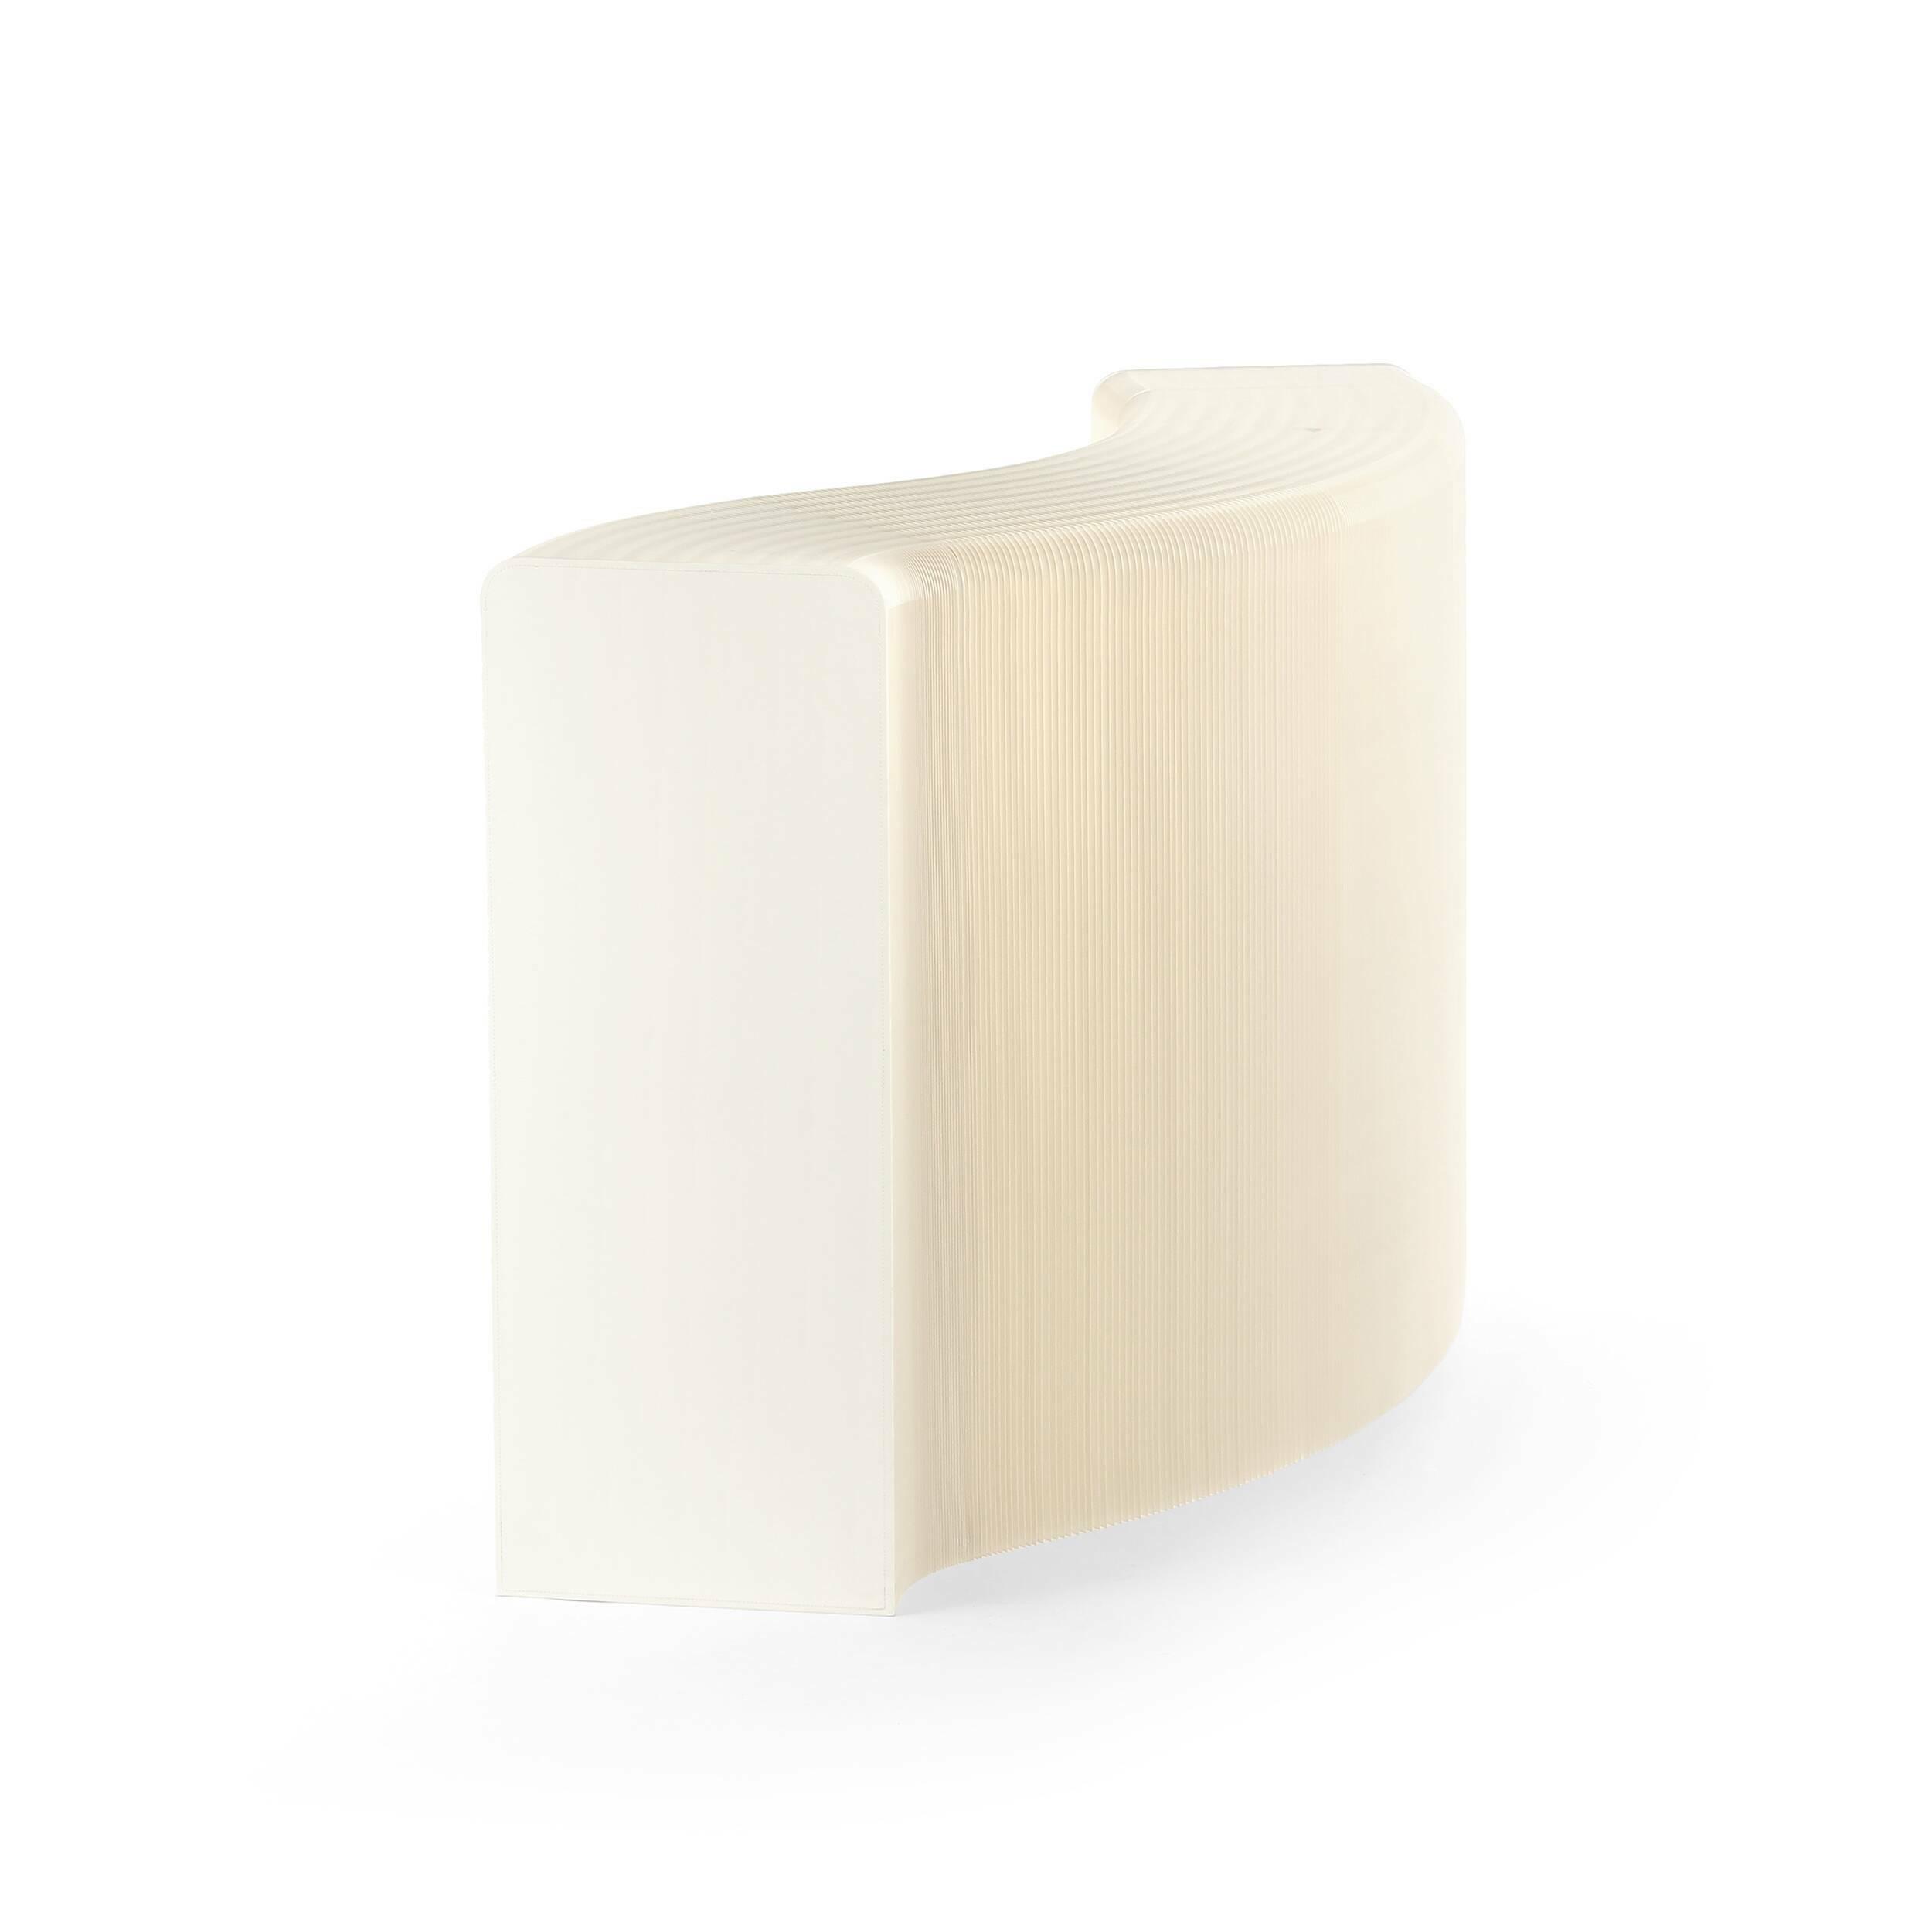 Полка бумажная 1104216Стеллажи<br><br><br>stock: 5<br>Высота: 110<br>Ширина: 42<br>Тип материала каркаса: Бумага<br>Цвет каркаса: Белый